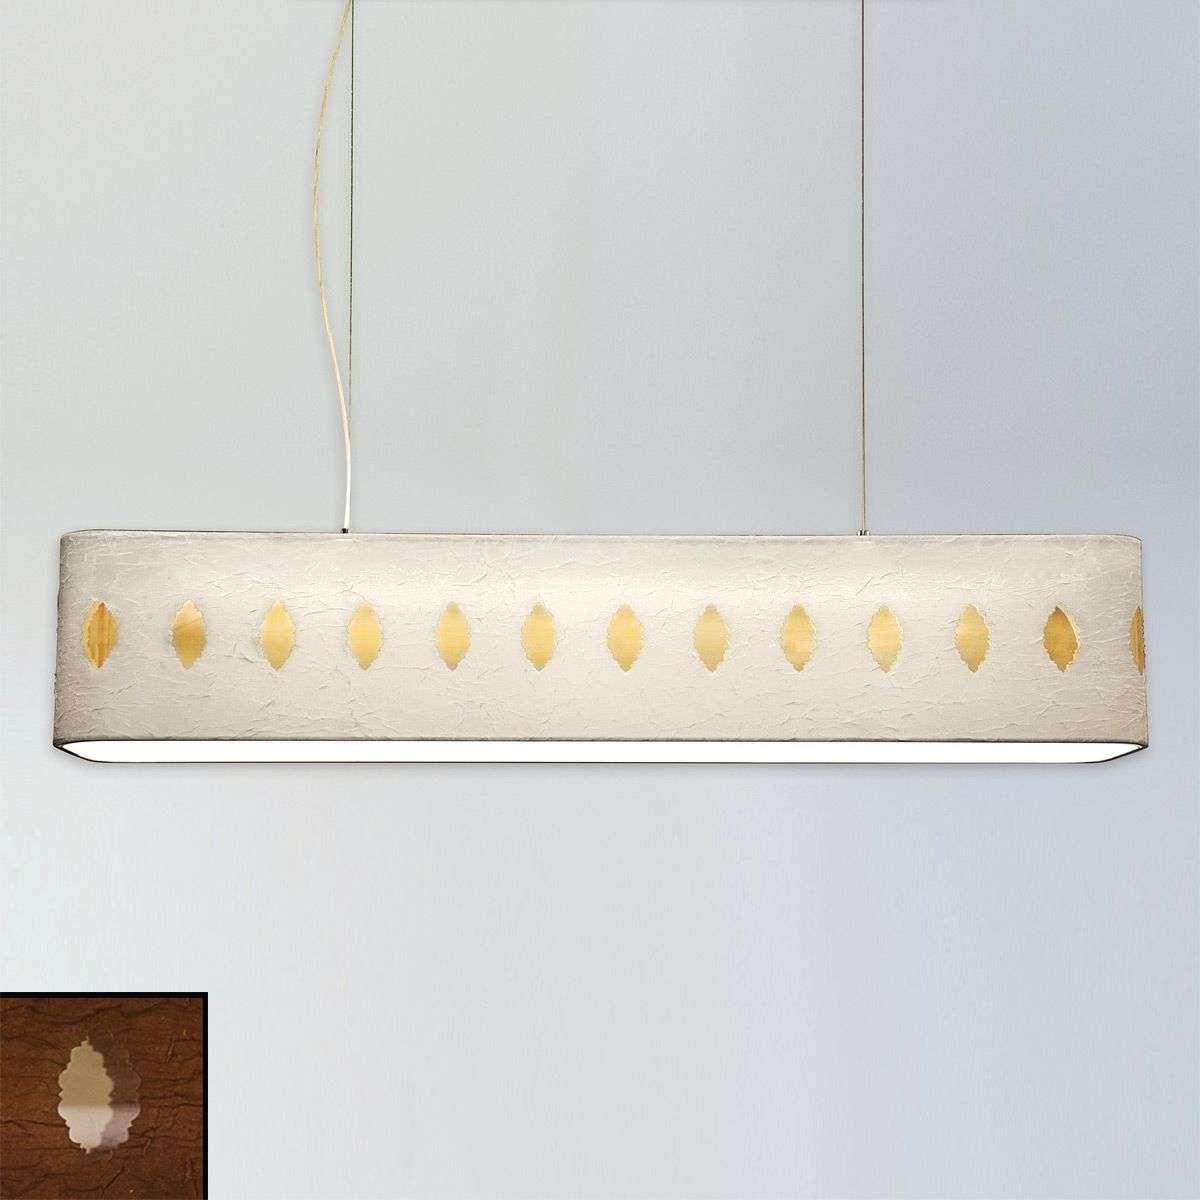 decorative hanging light lavina 130 cm lights ie